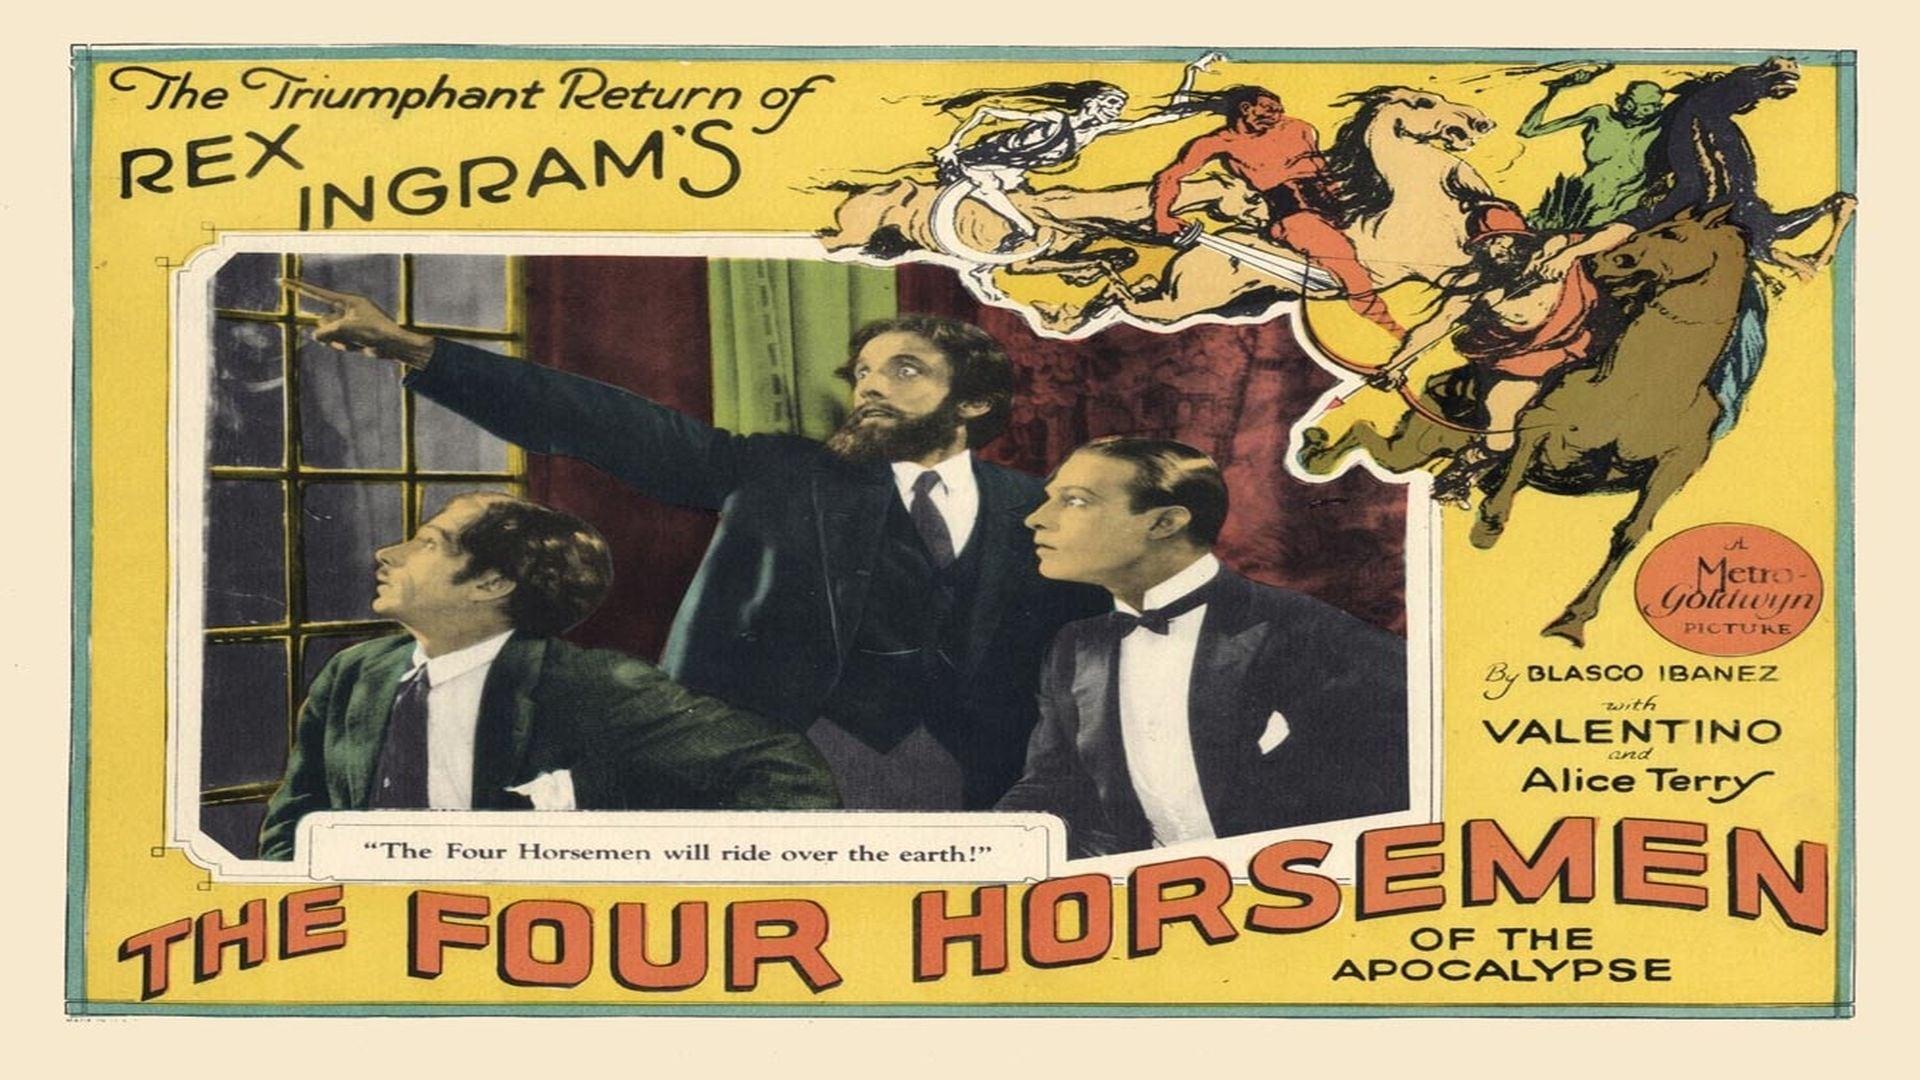 vicente blasco ibanez the fours horsemen of the apocalypse pdf